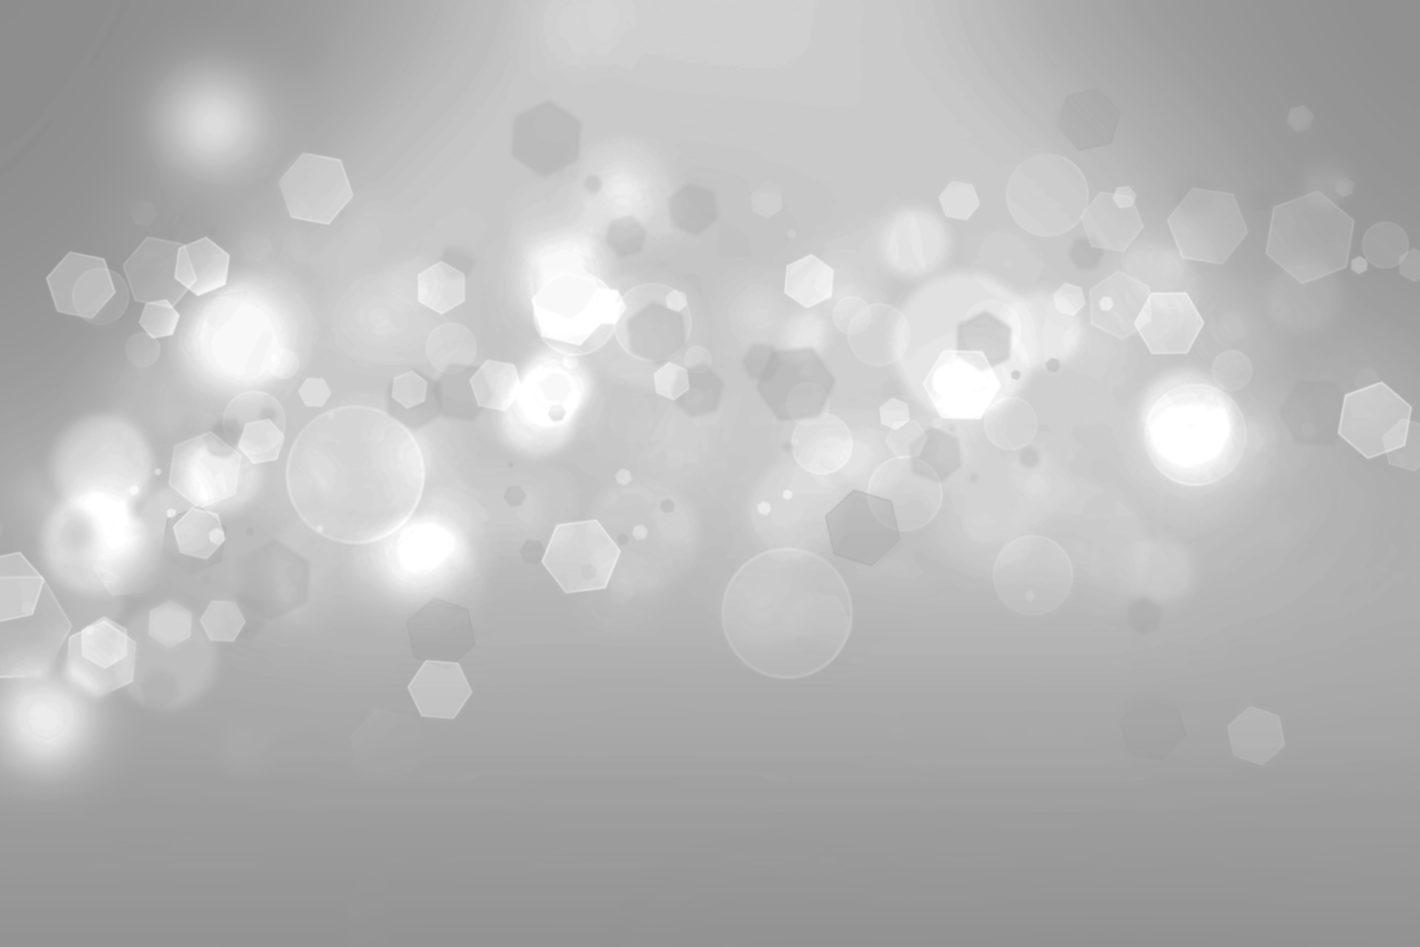 bg-lights